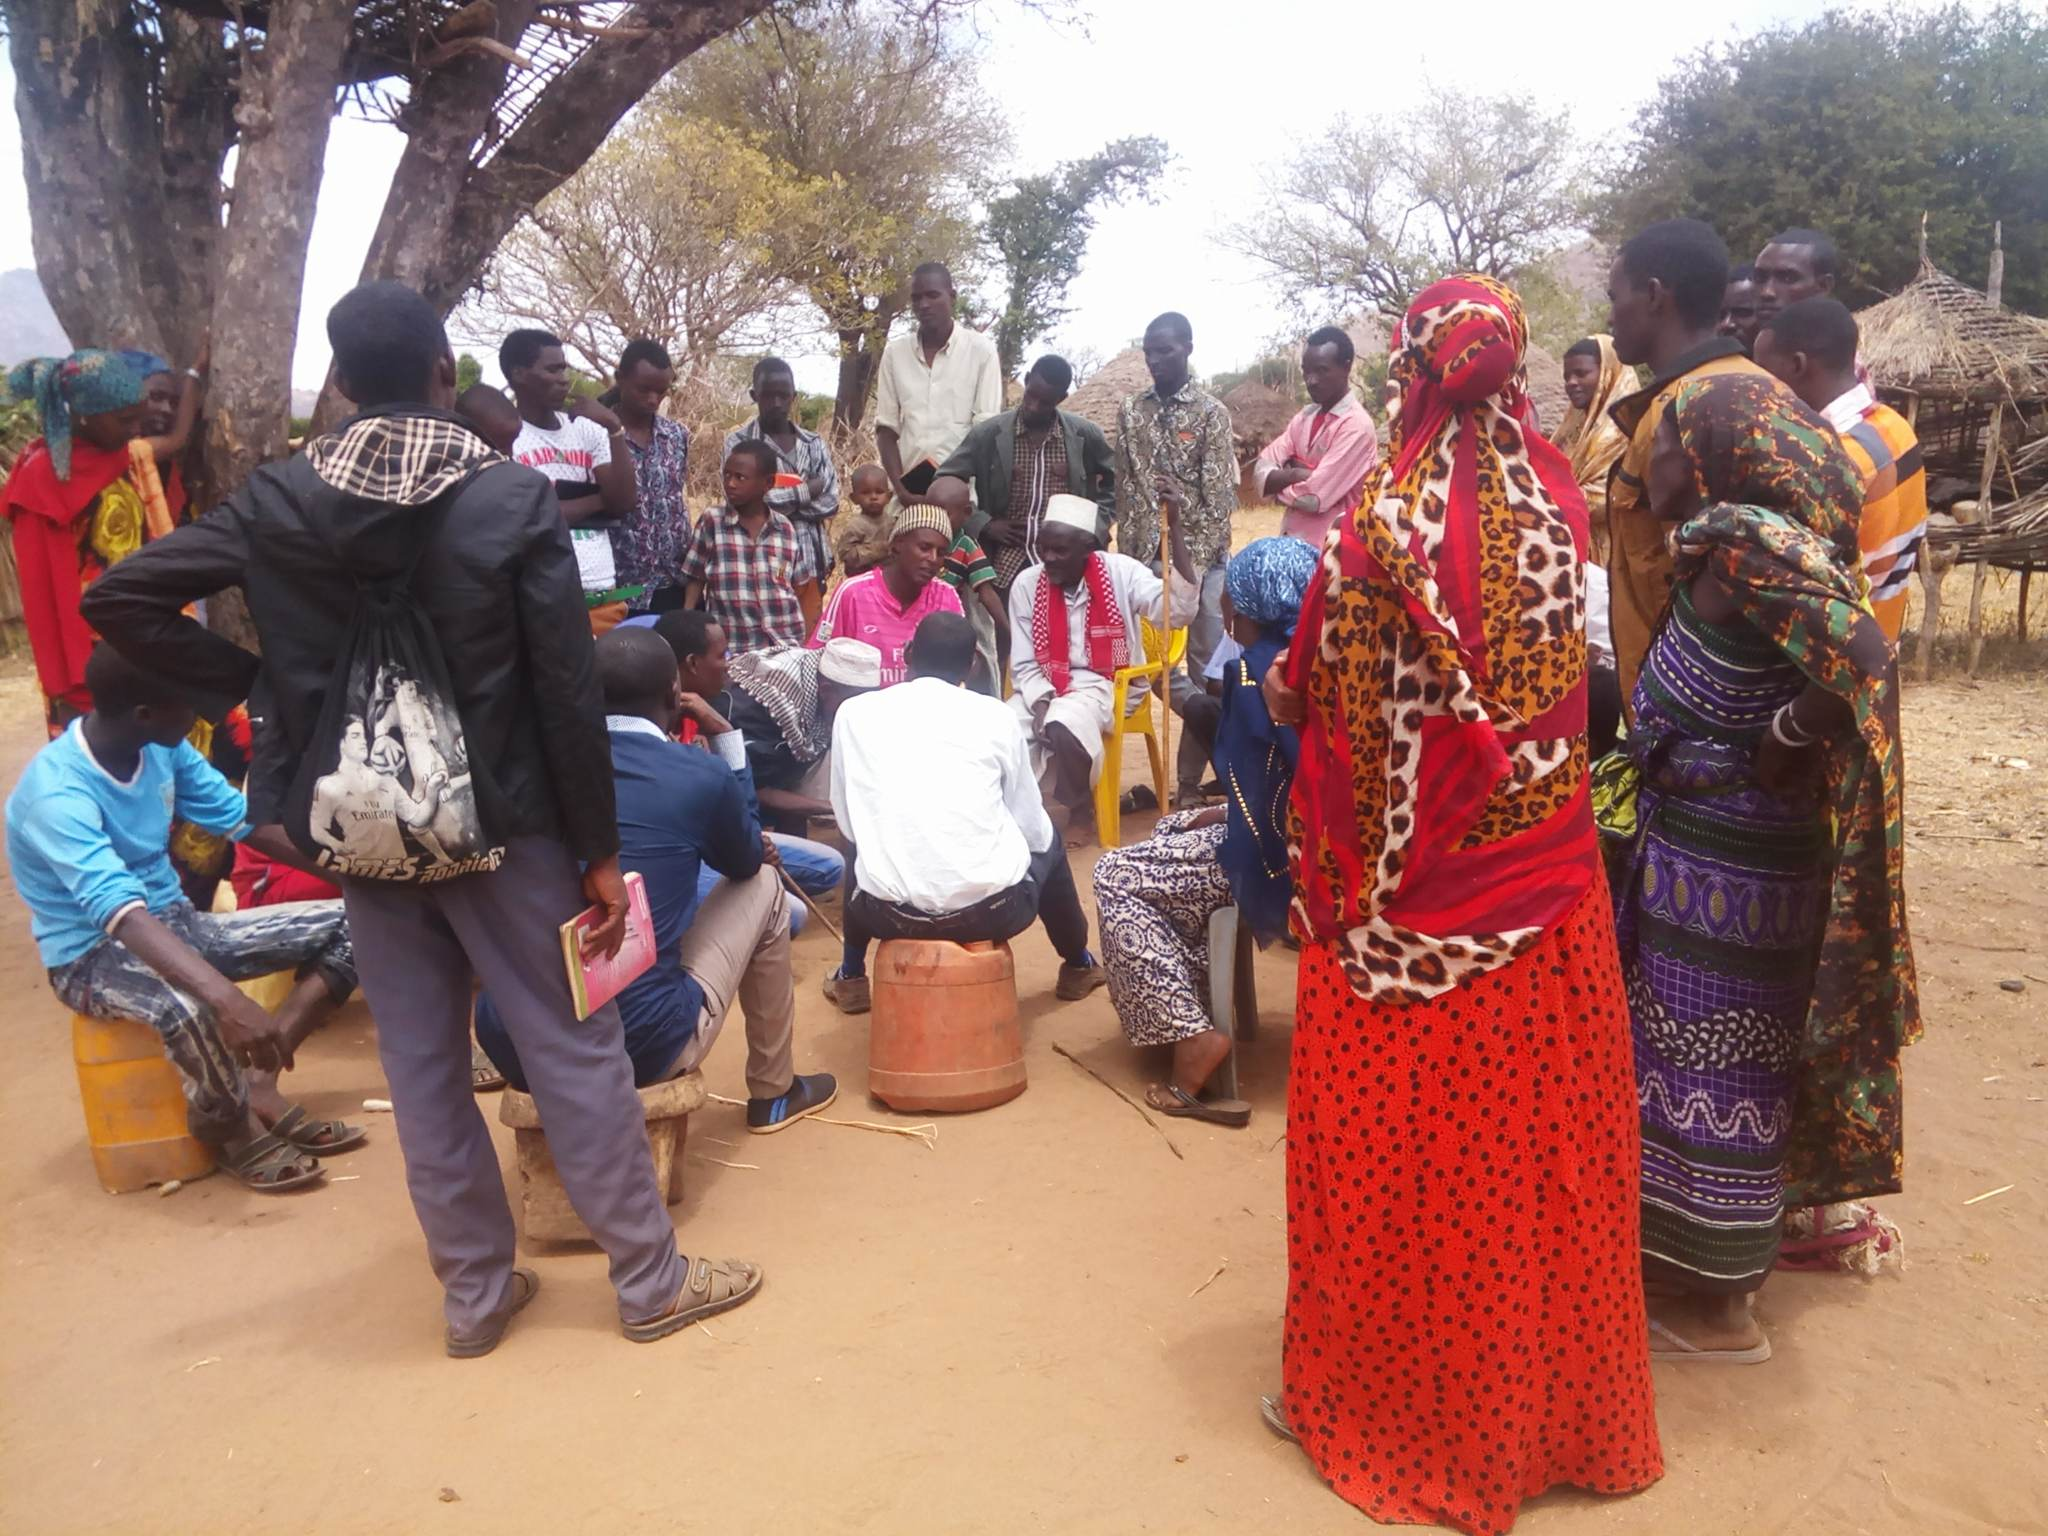 brother William witnessing muslims gmfc Kenya 2